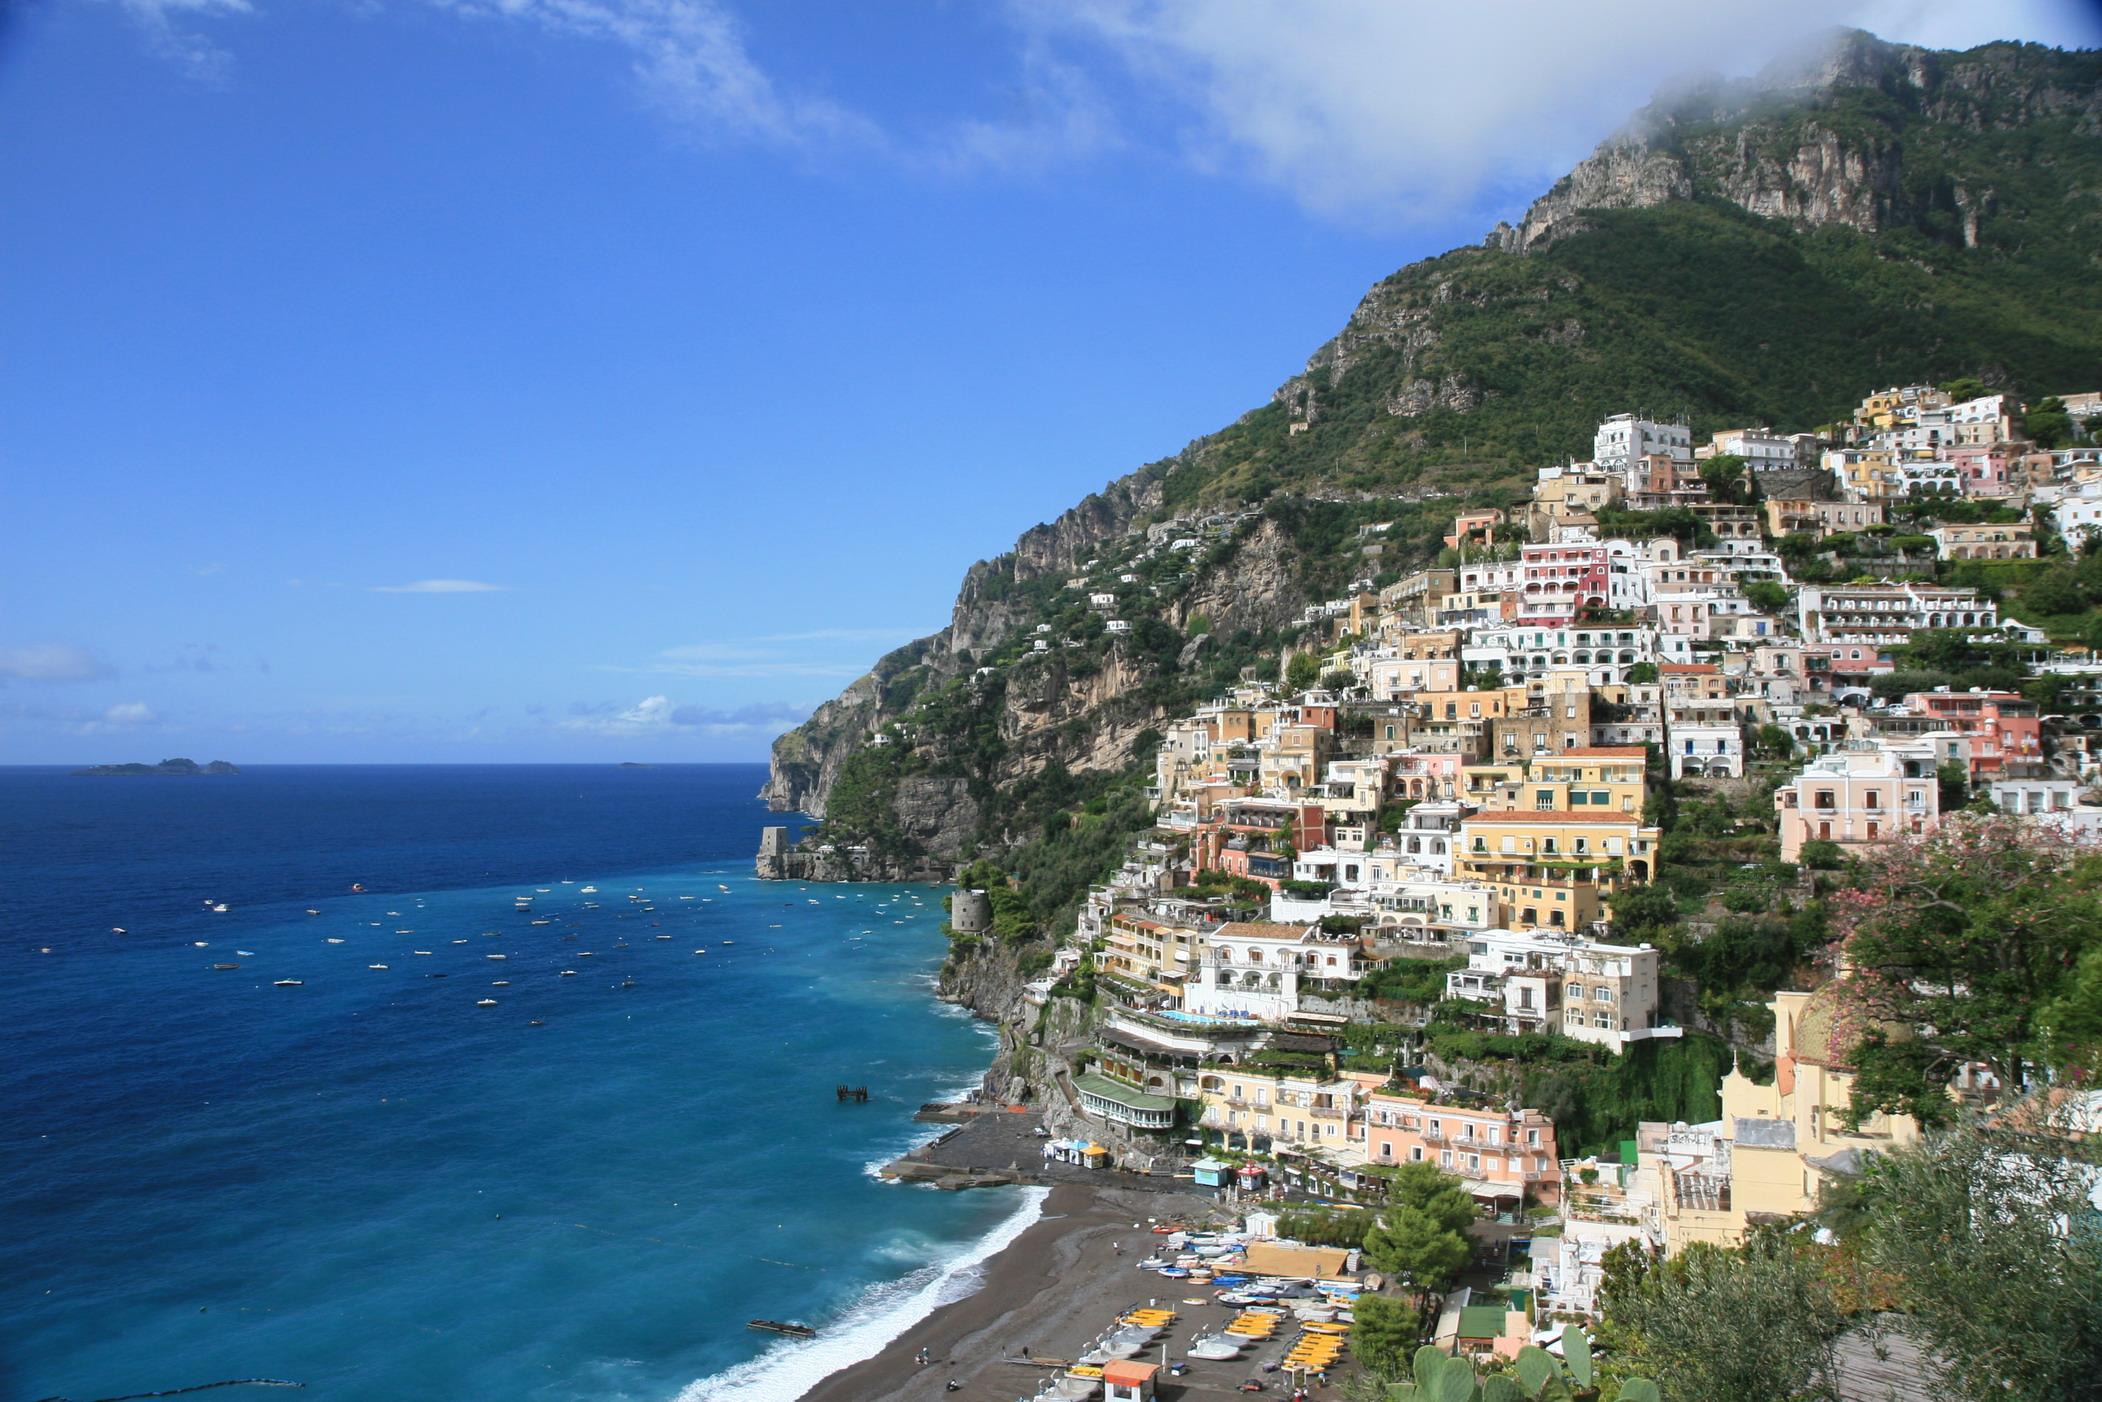 Vacanze Costiera Amalfitana - Spiaggia Positano